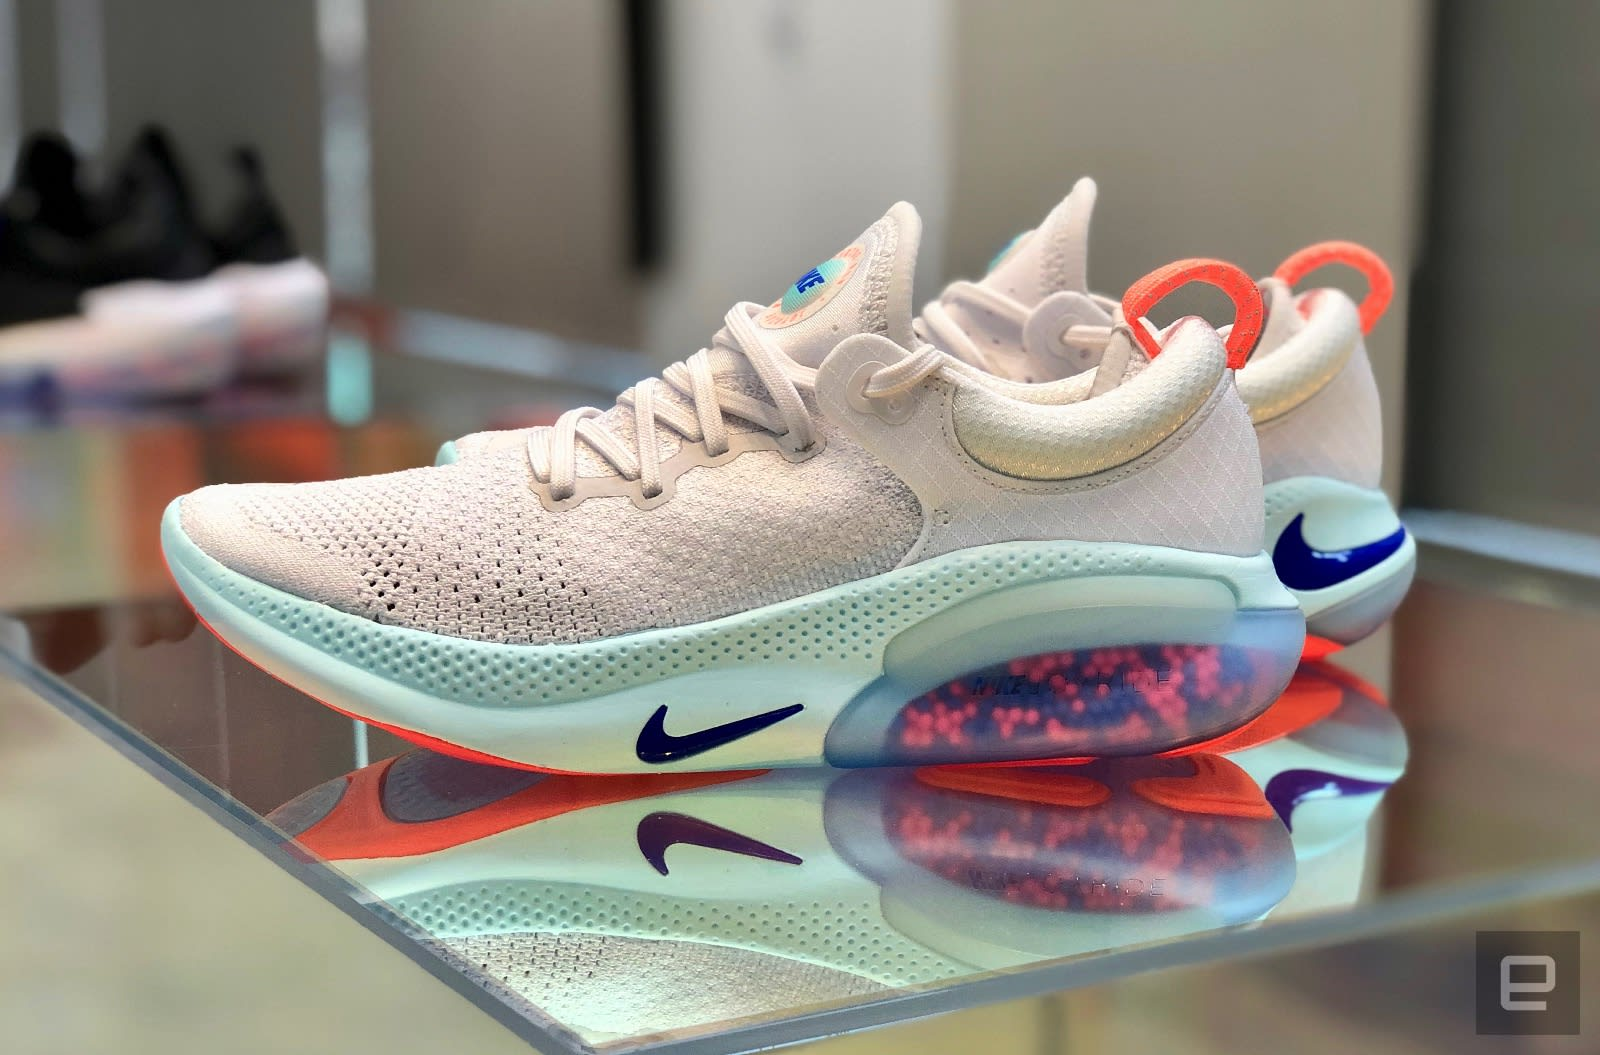 premium selection 2753e df8d2 Nike's Joyride shoes use tiny beads to make your runs more ...